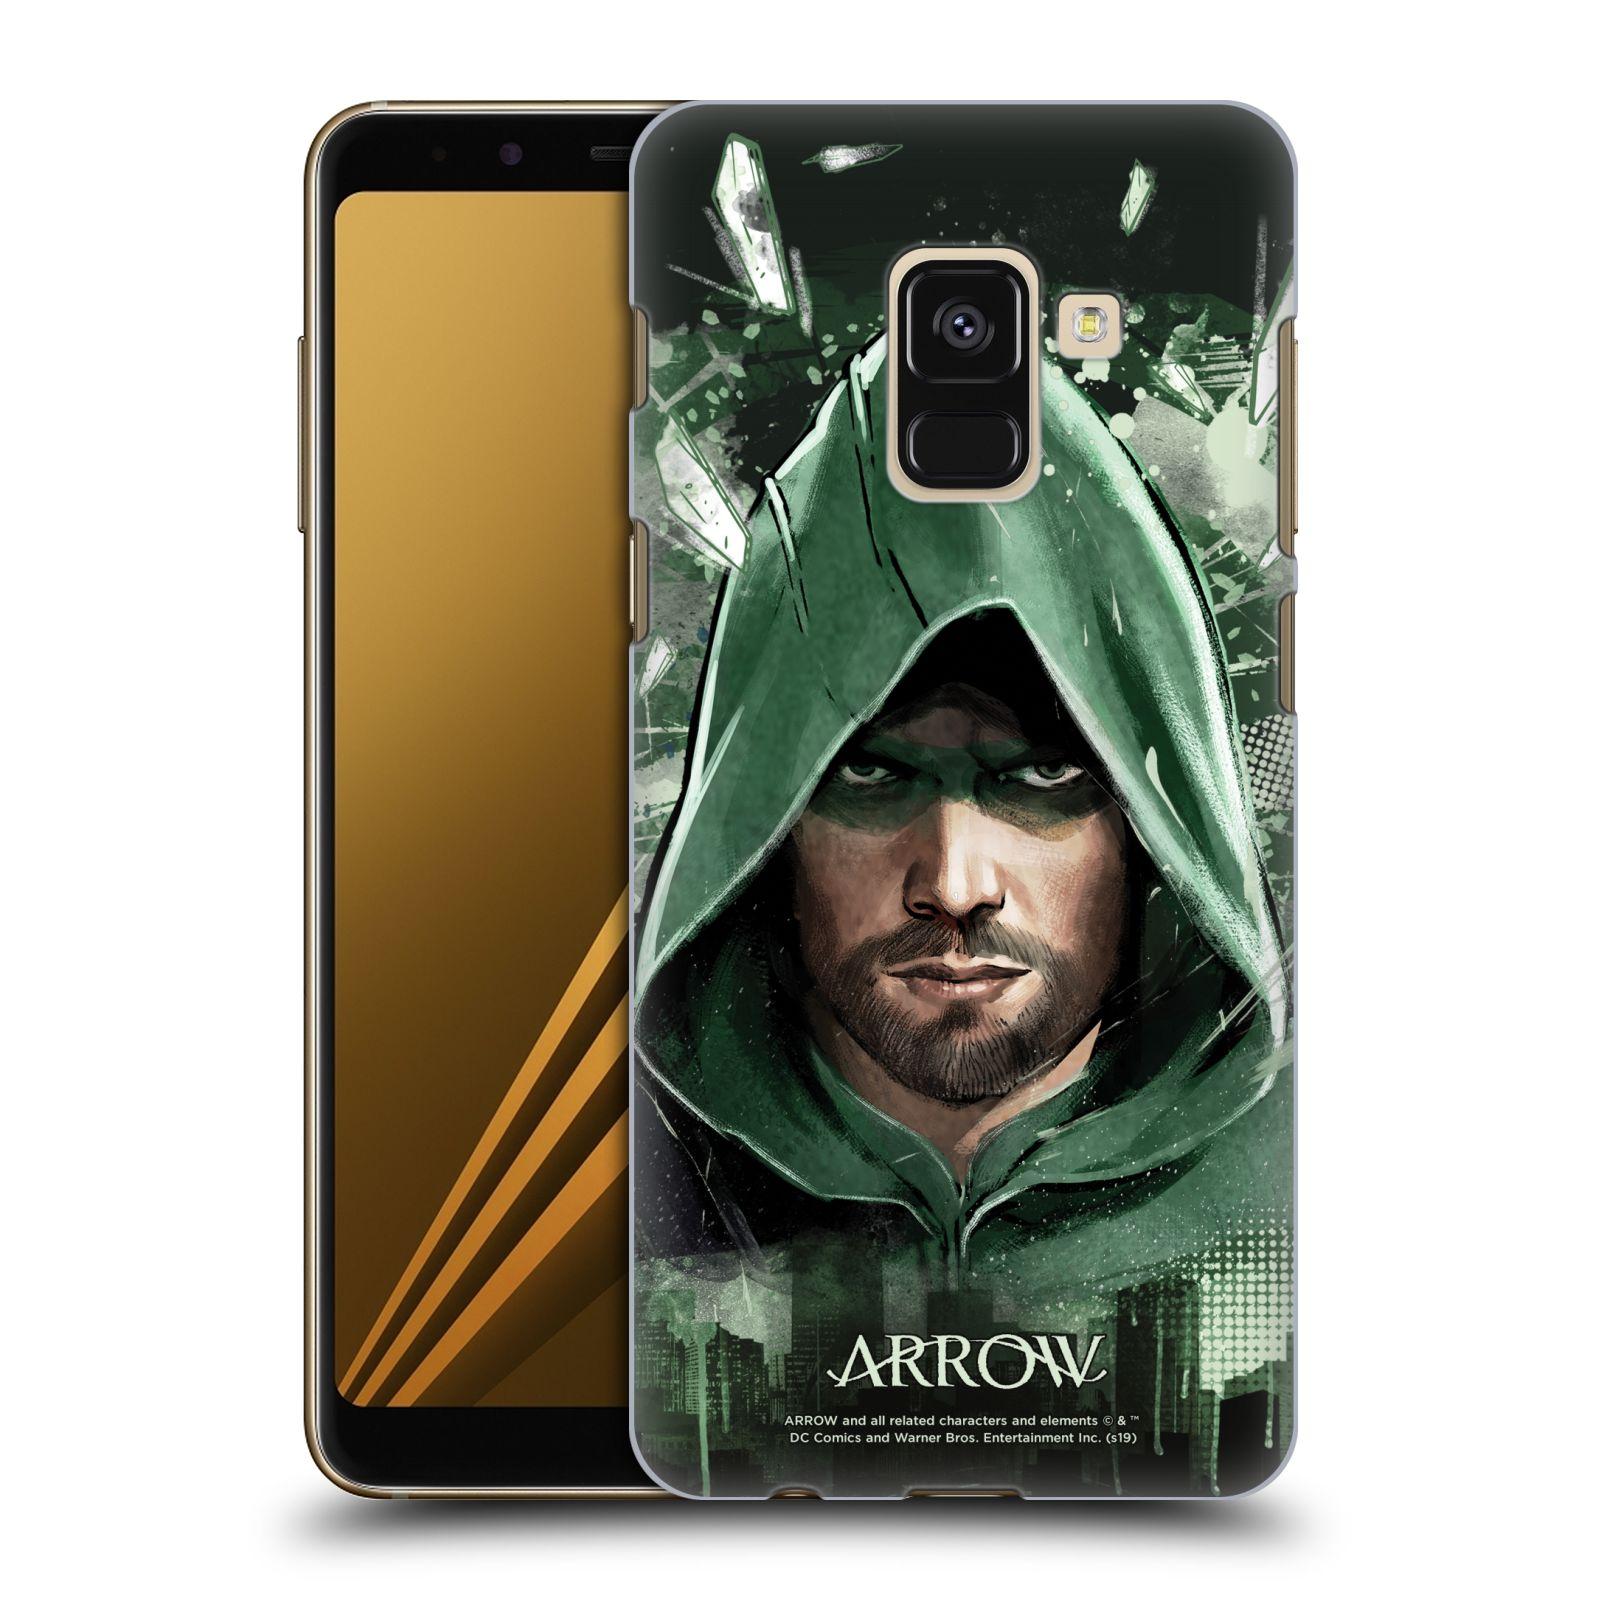 Pouzdro na mobil Samsung Galaxy A8+ 2018, A8 PLUS 2018 - HEAD CASE - Seriál Arrow - kreslený motiv